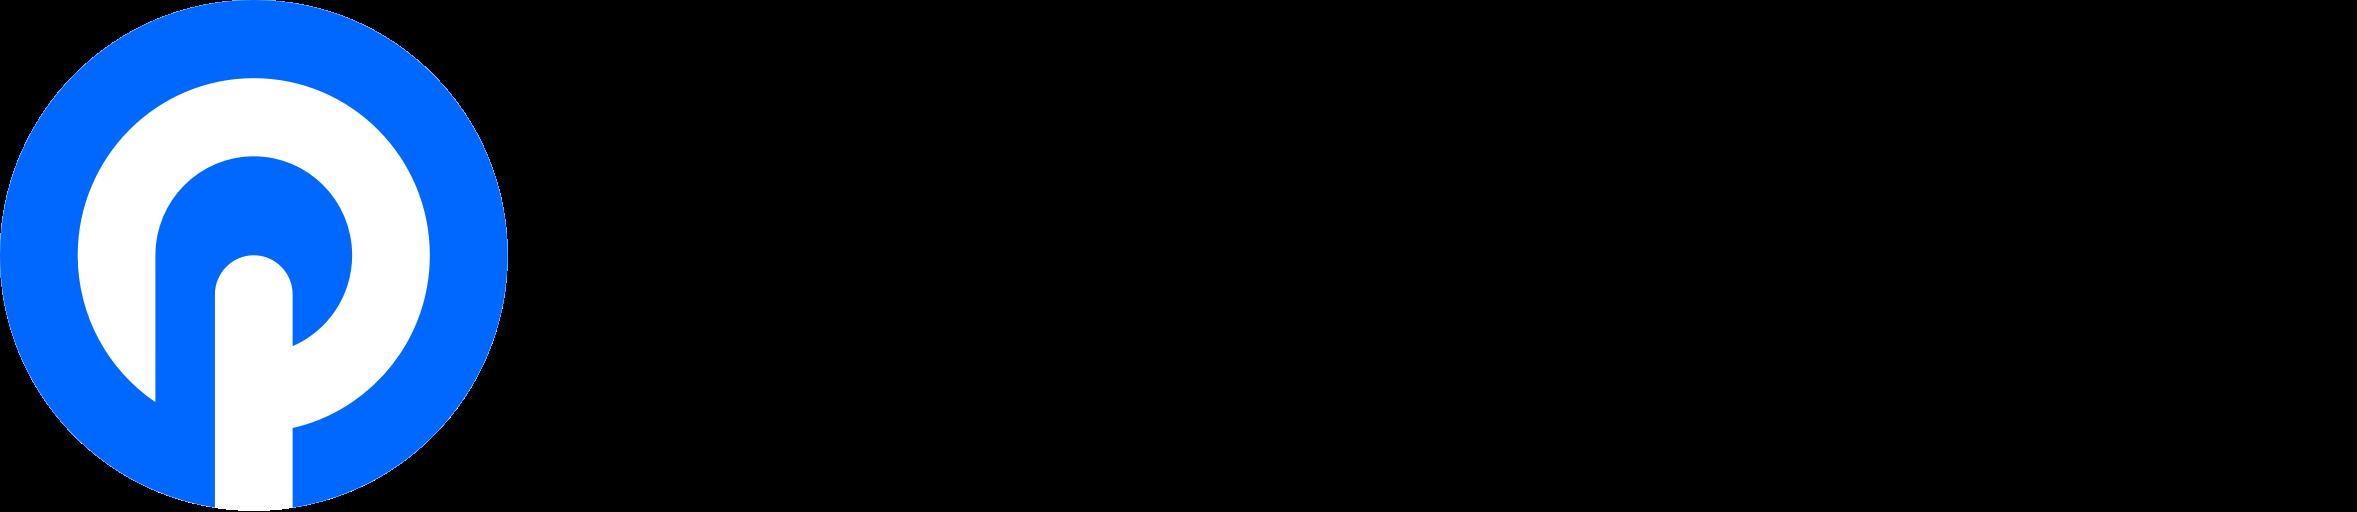 Podhero logo